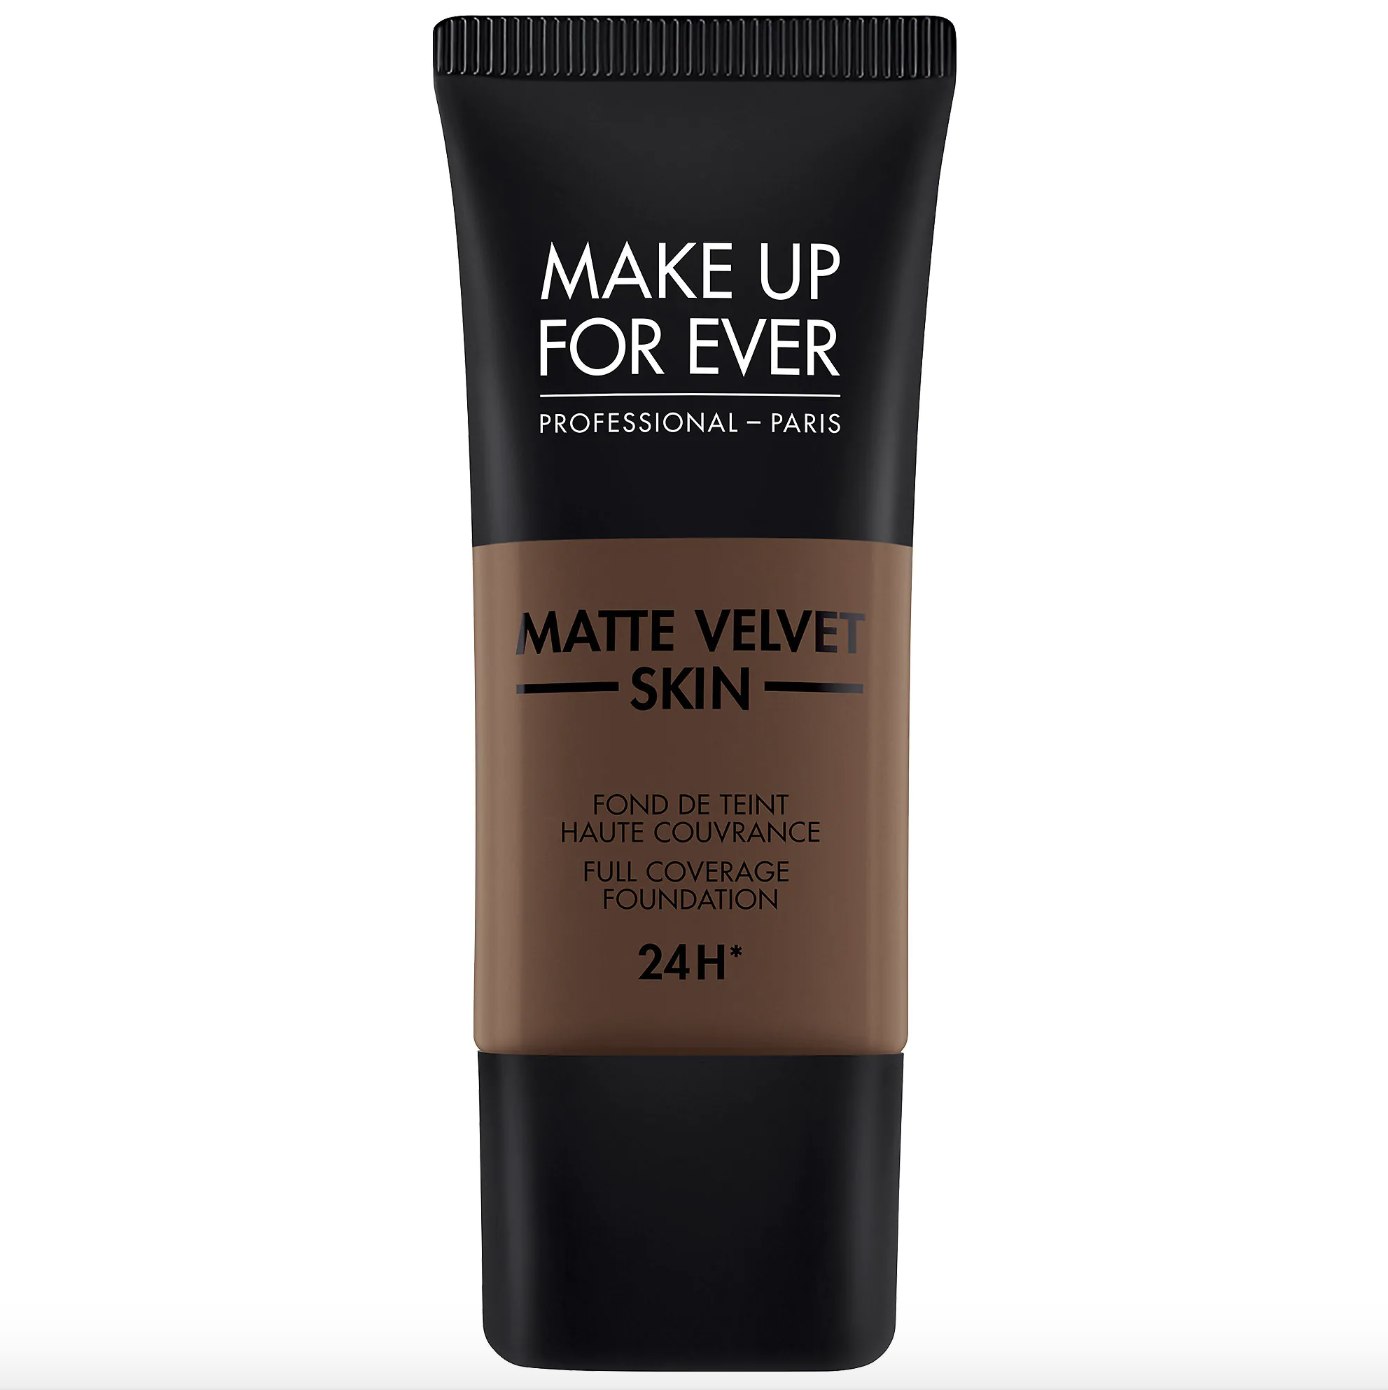 15 Best Foundations For Dark Skin Tones